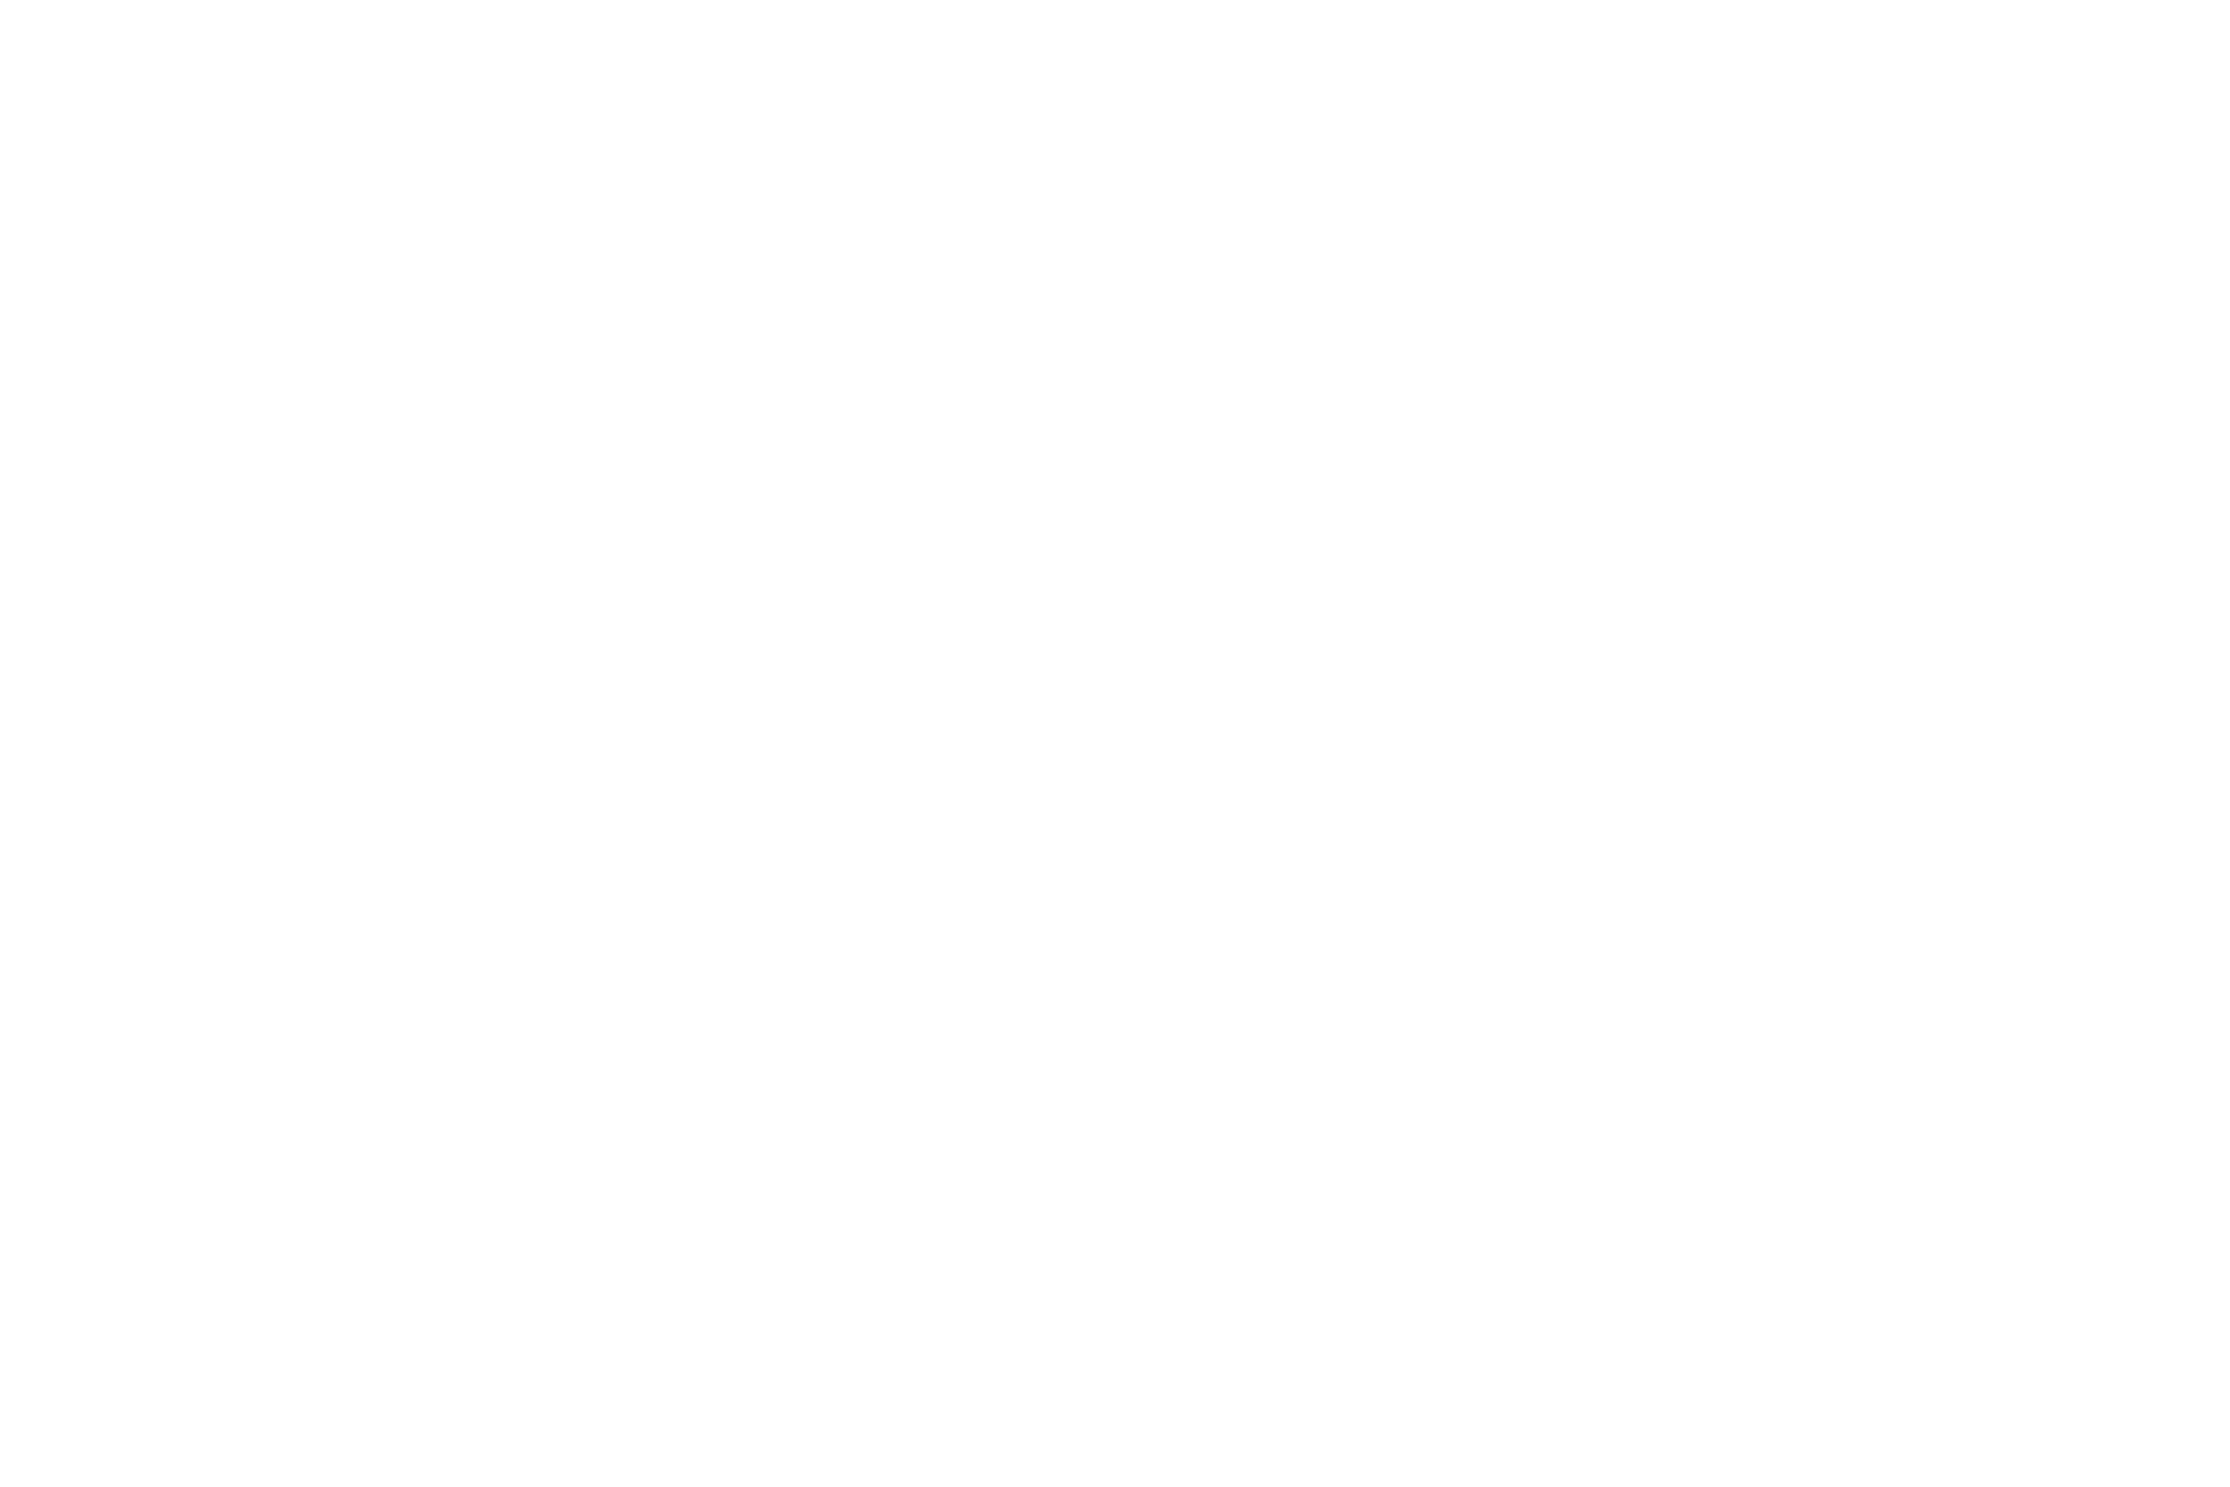 vaclavkral.com